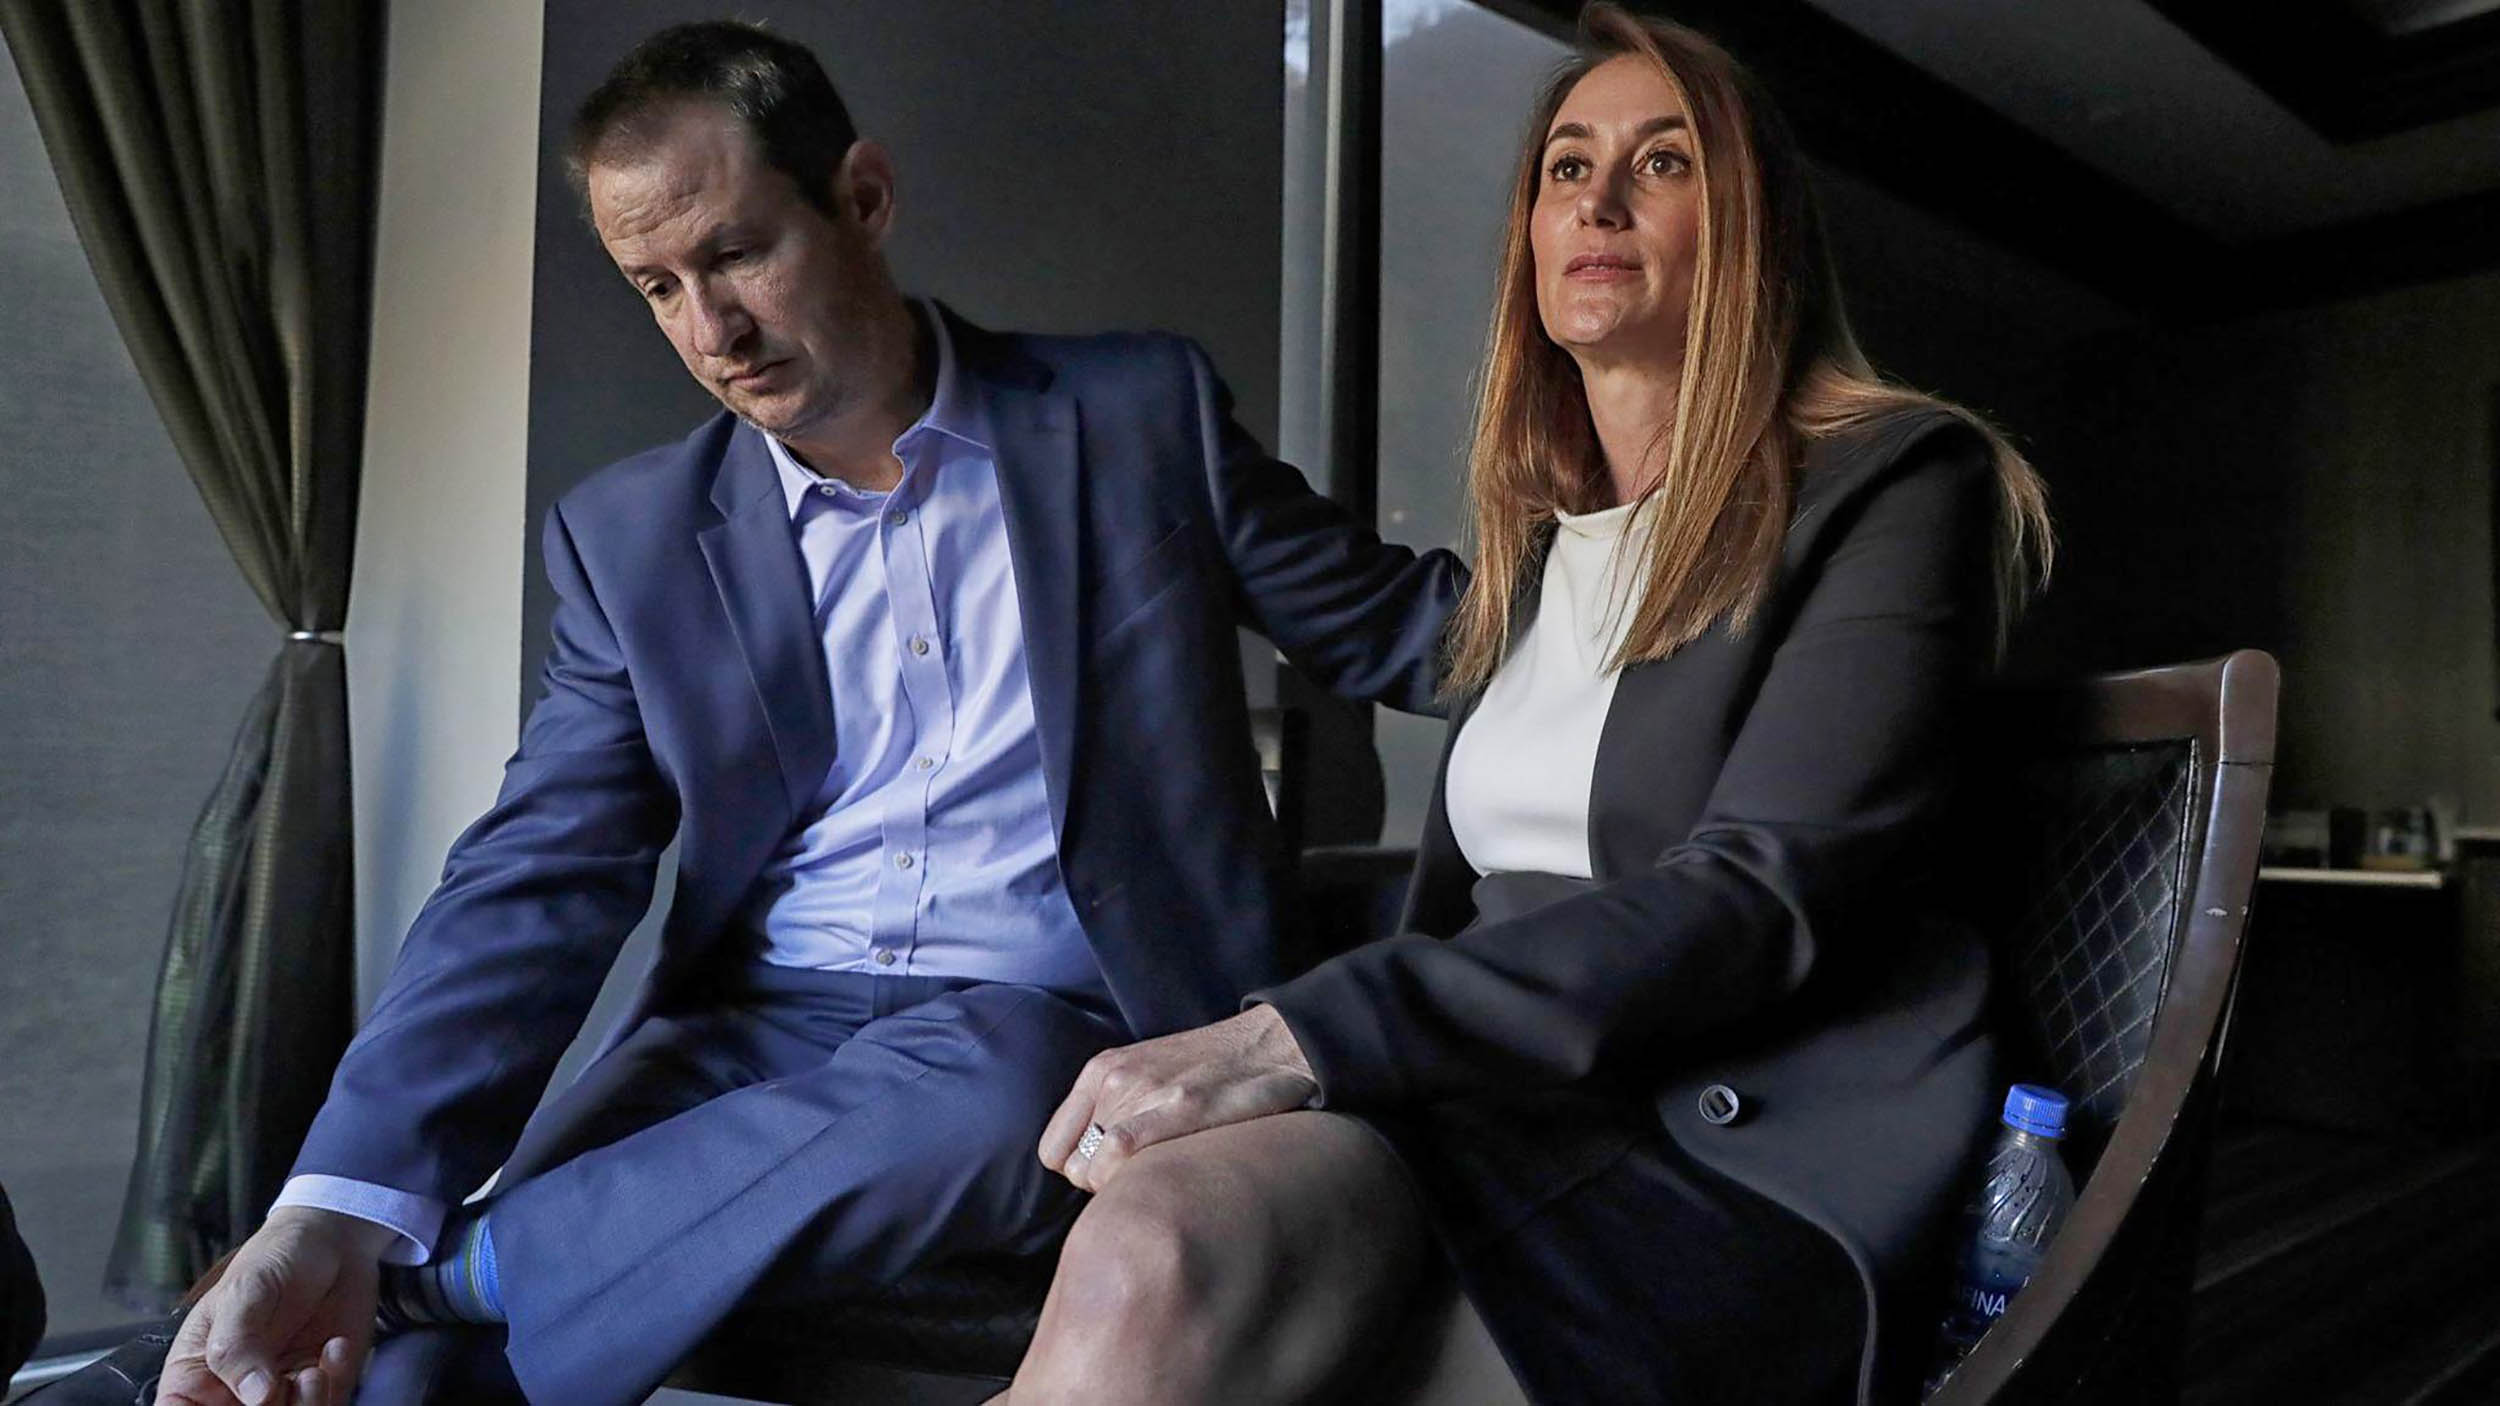 The parents of Blaze Bernstein, Gideon and Jeanne Pepper Bernstein during a marathon of interviews at a Costa Mesa business club. (Robert Gauthier / Los Angeles Times)